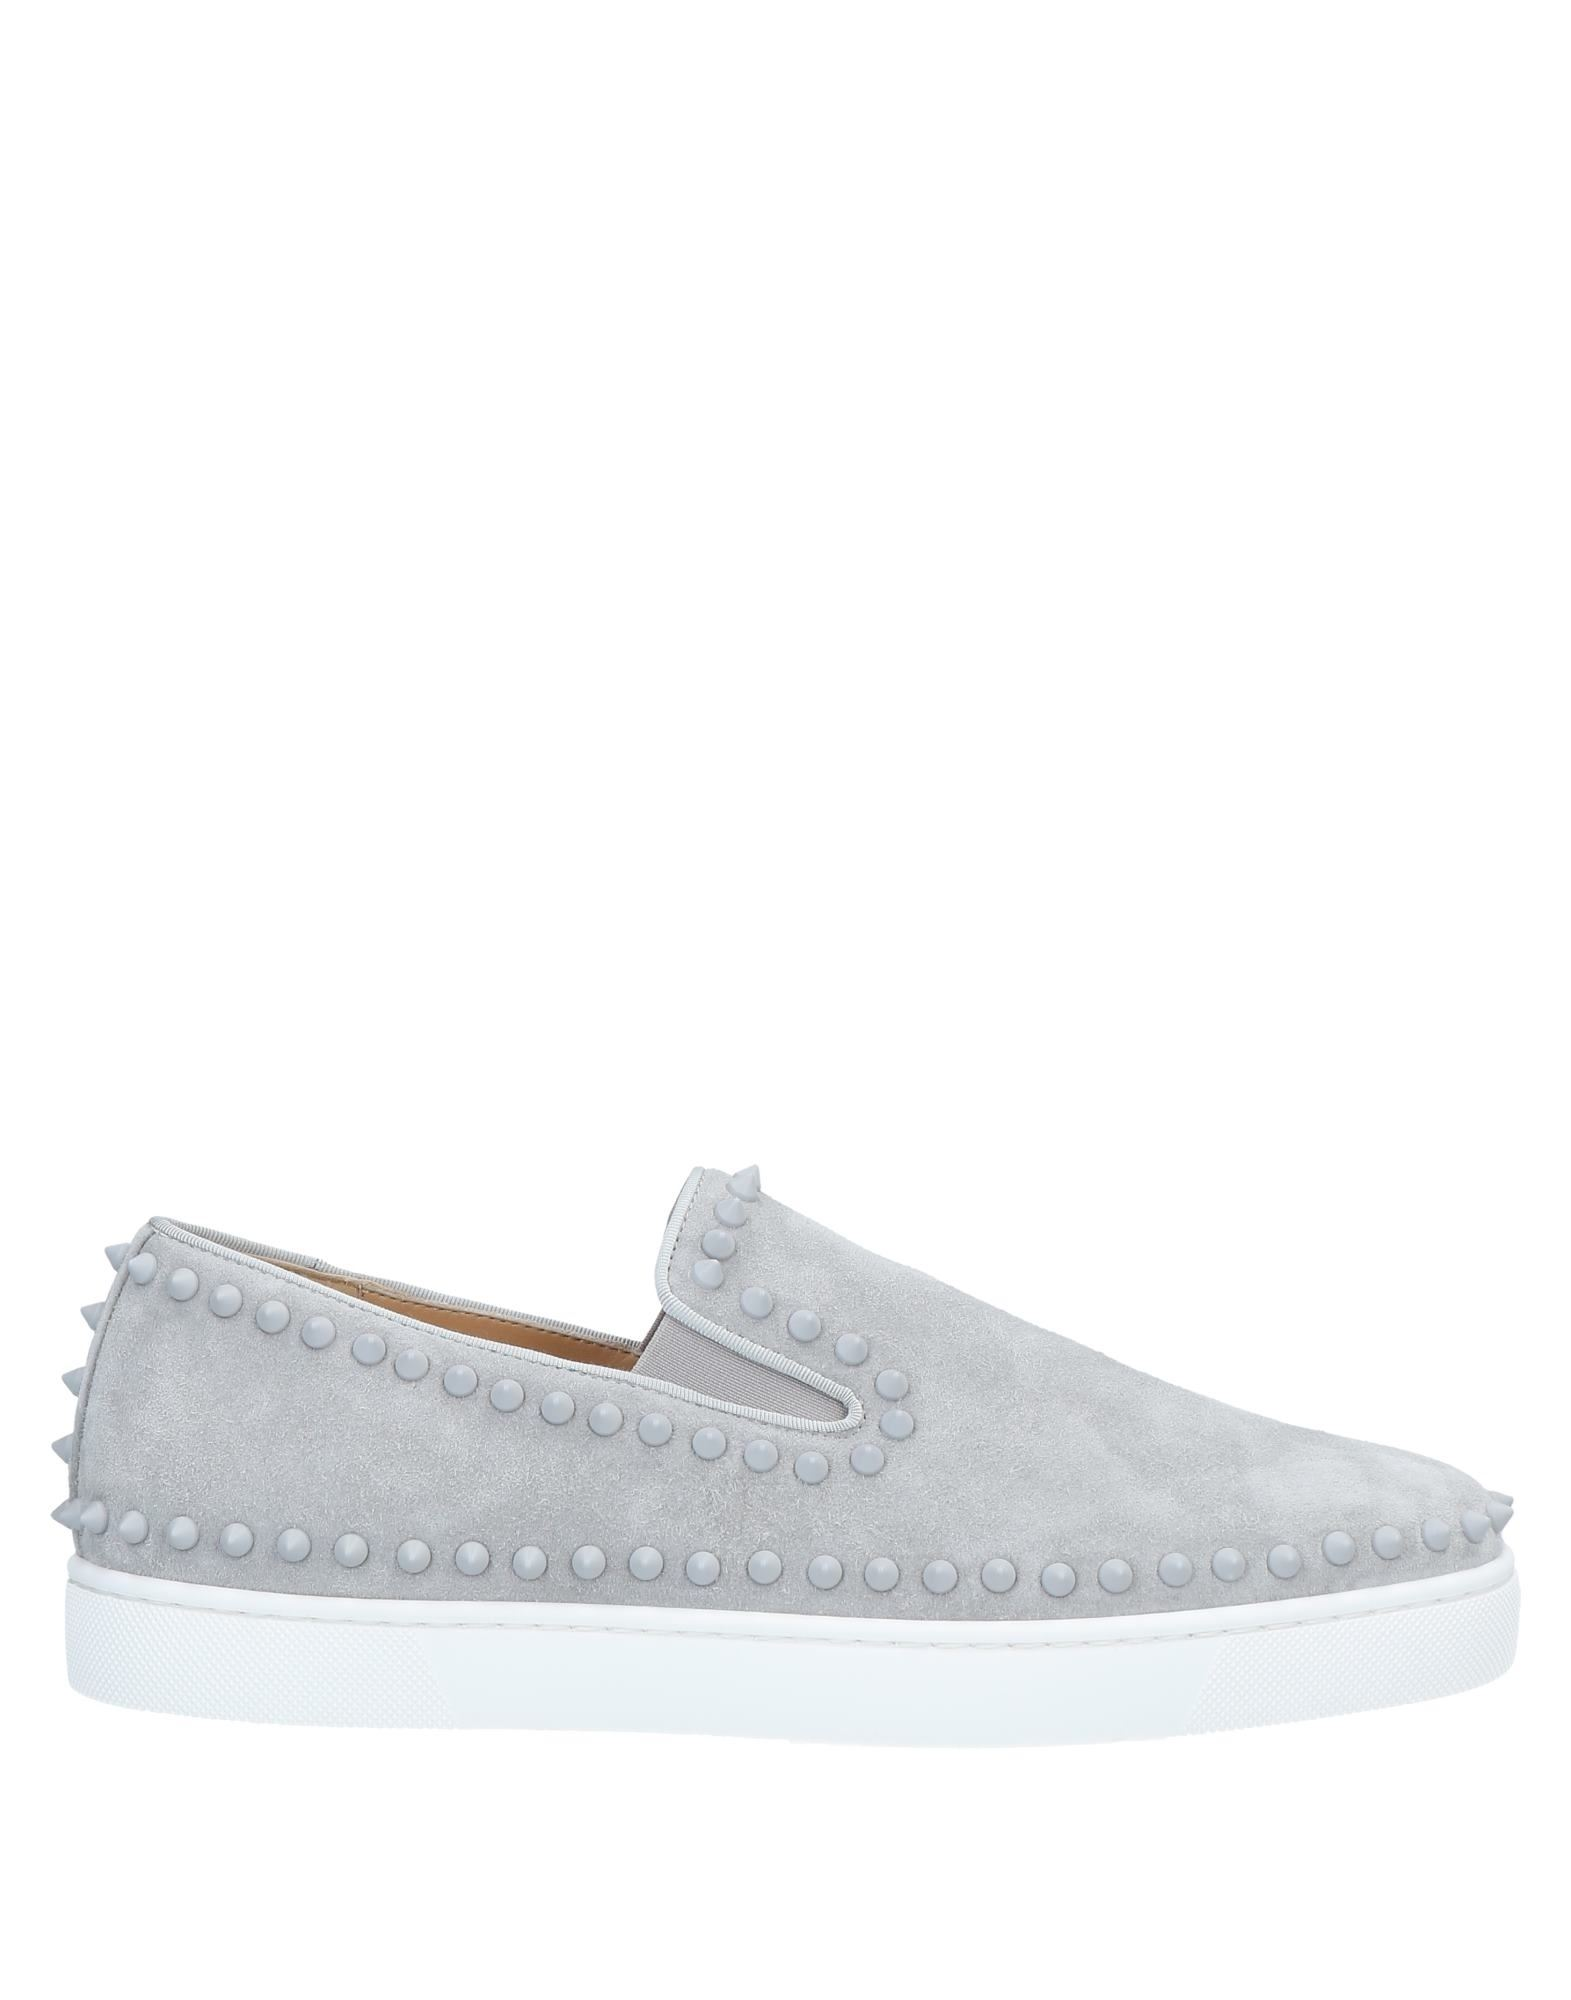 CHRISTIAN LOUBOUTIN Low-tops & sneakers - Item 17009479